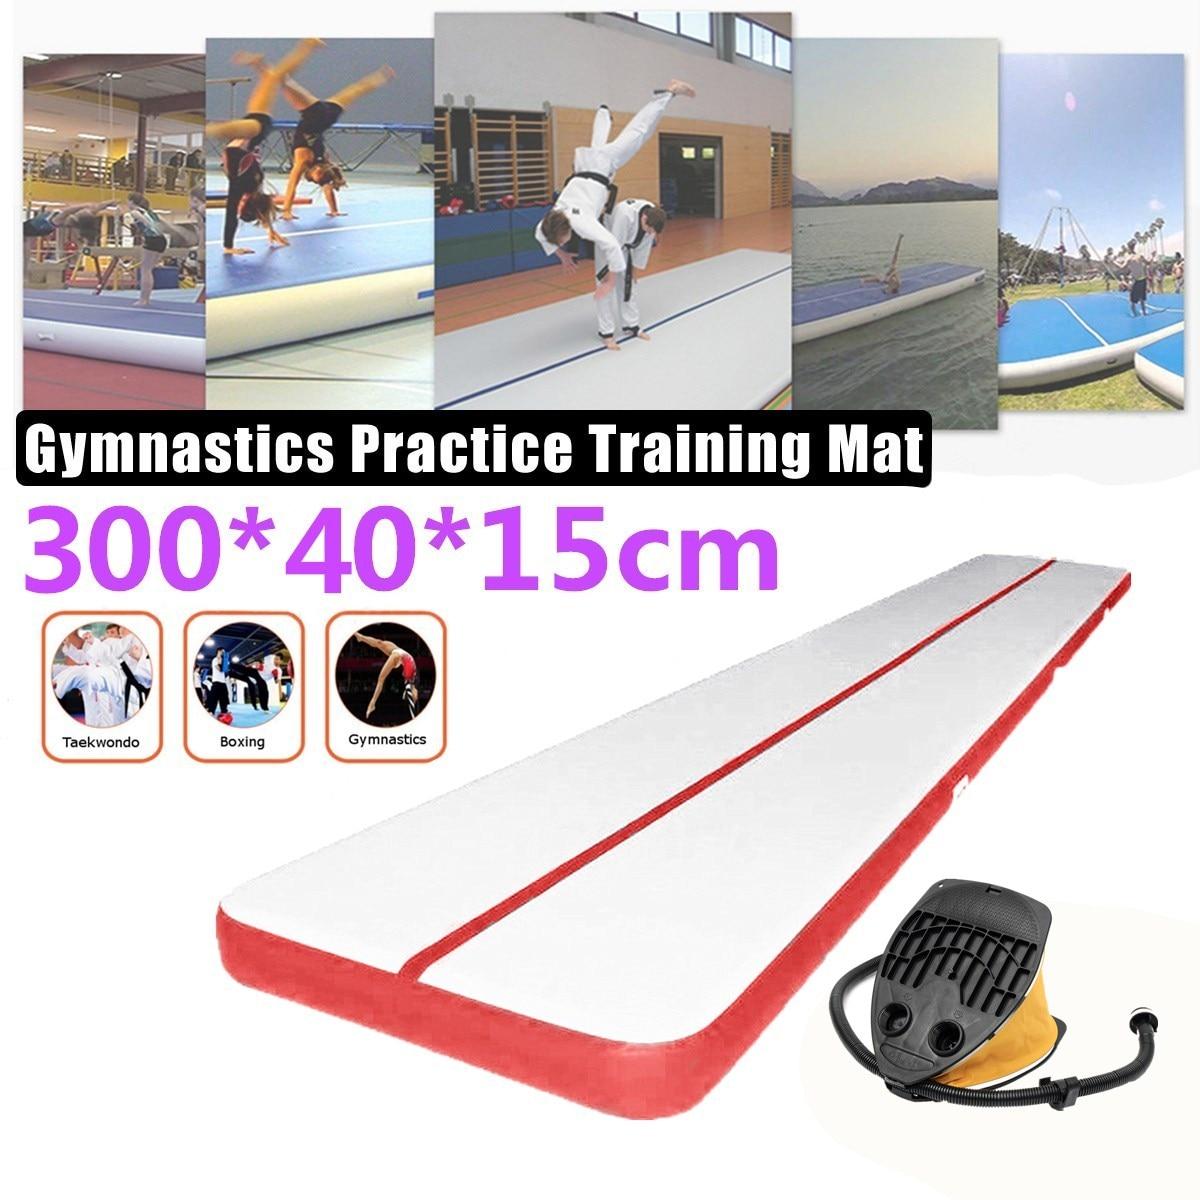 300*40*15 cm gonflable flottant Airtrack tapis de gymnastique Air Tumbling gonflable GYM Air piste tapis - 6